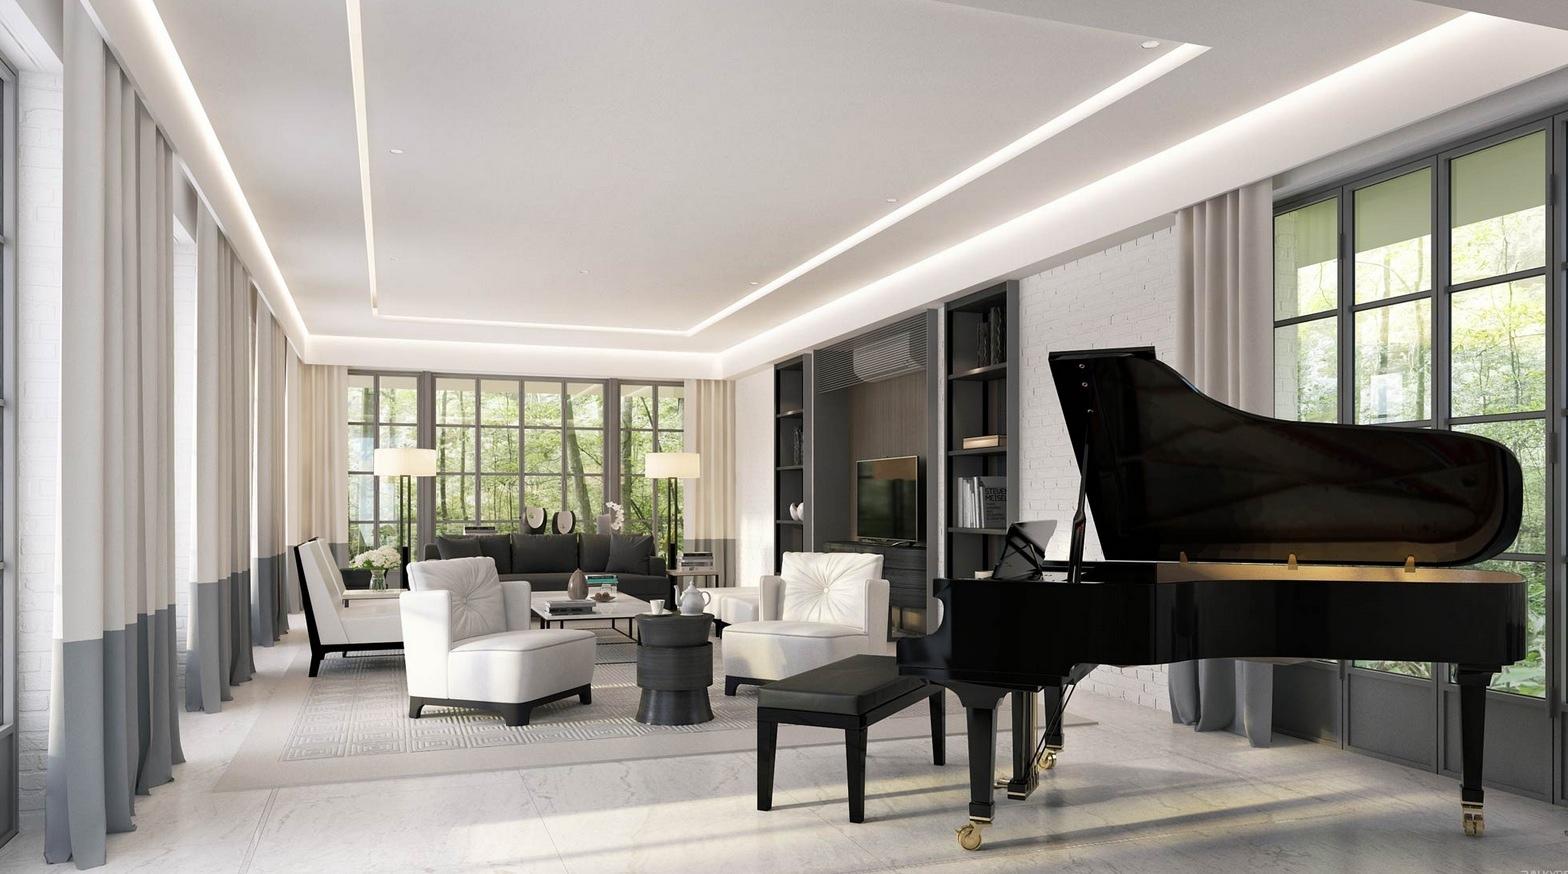 salon moderno diseno sillones blancos sofa negra ideas